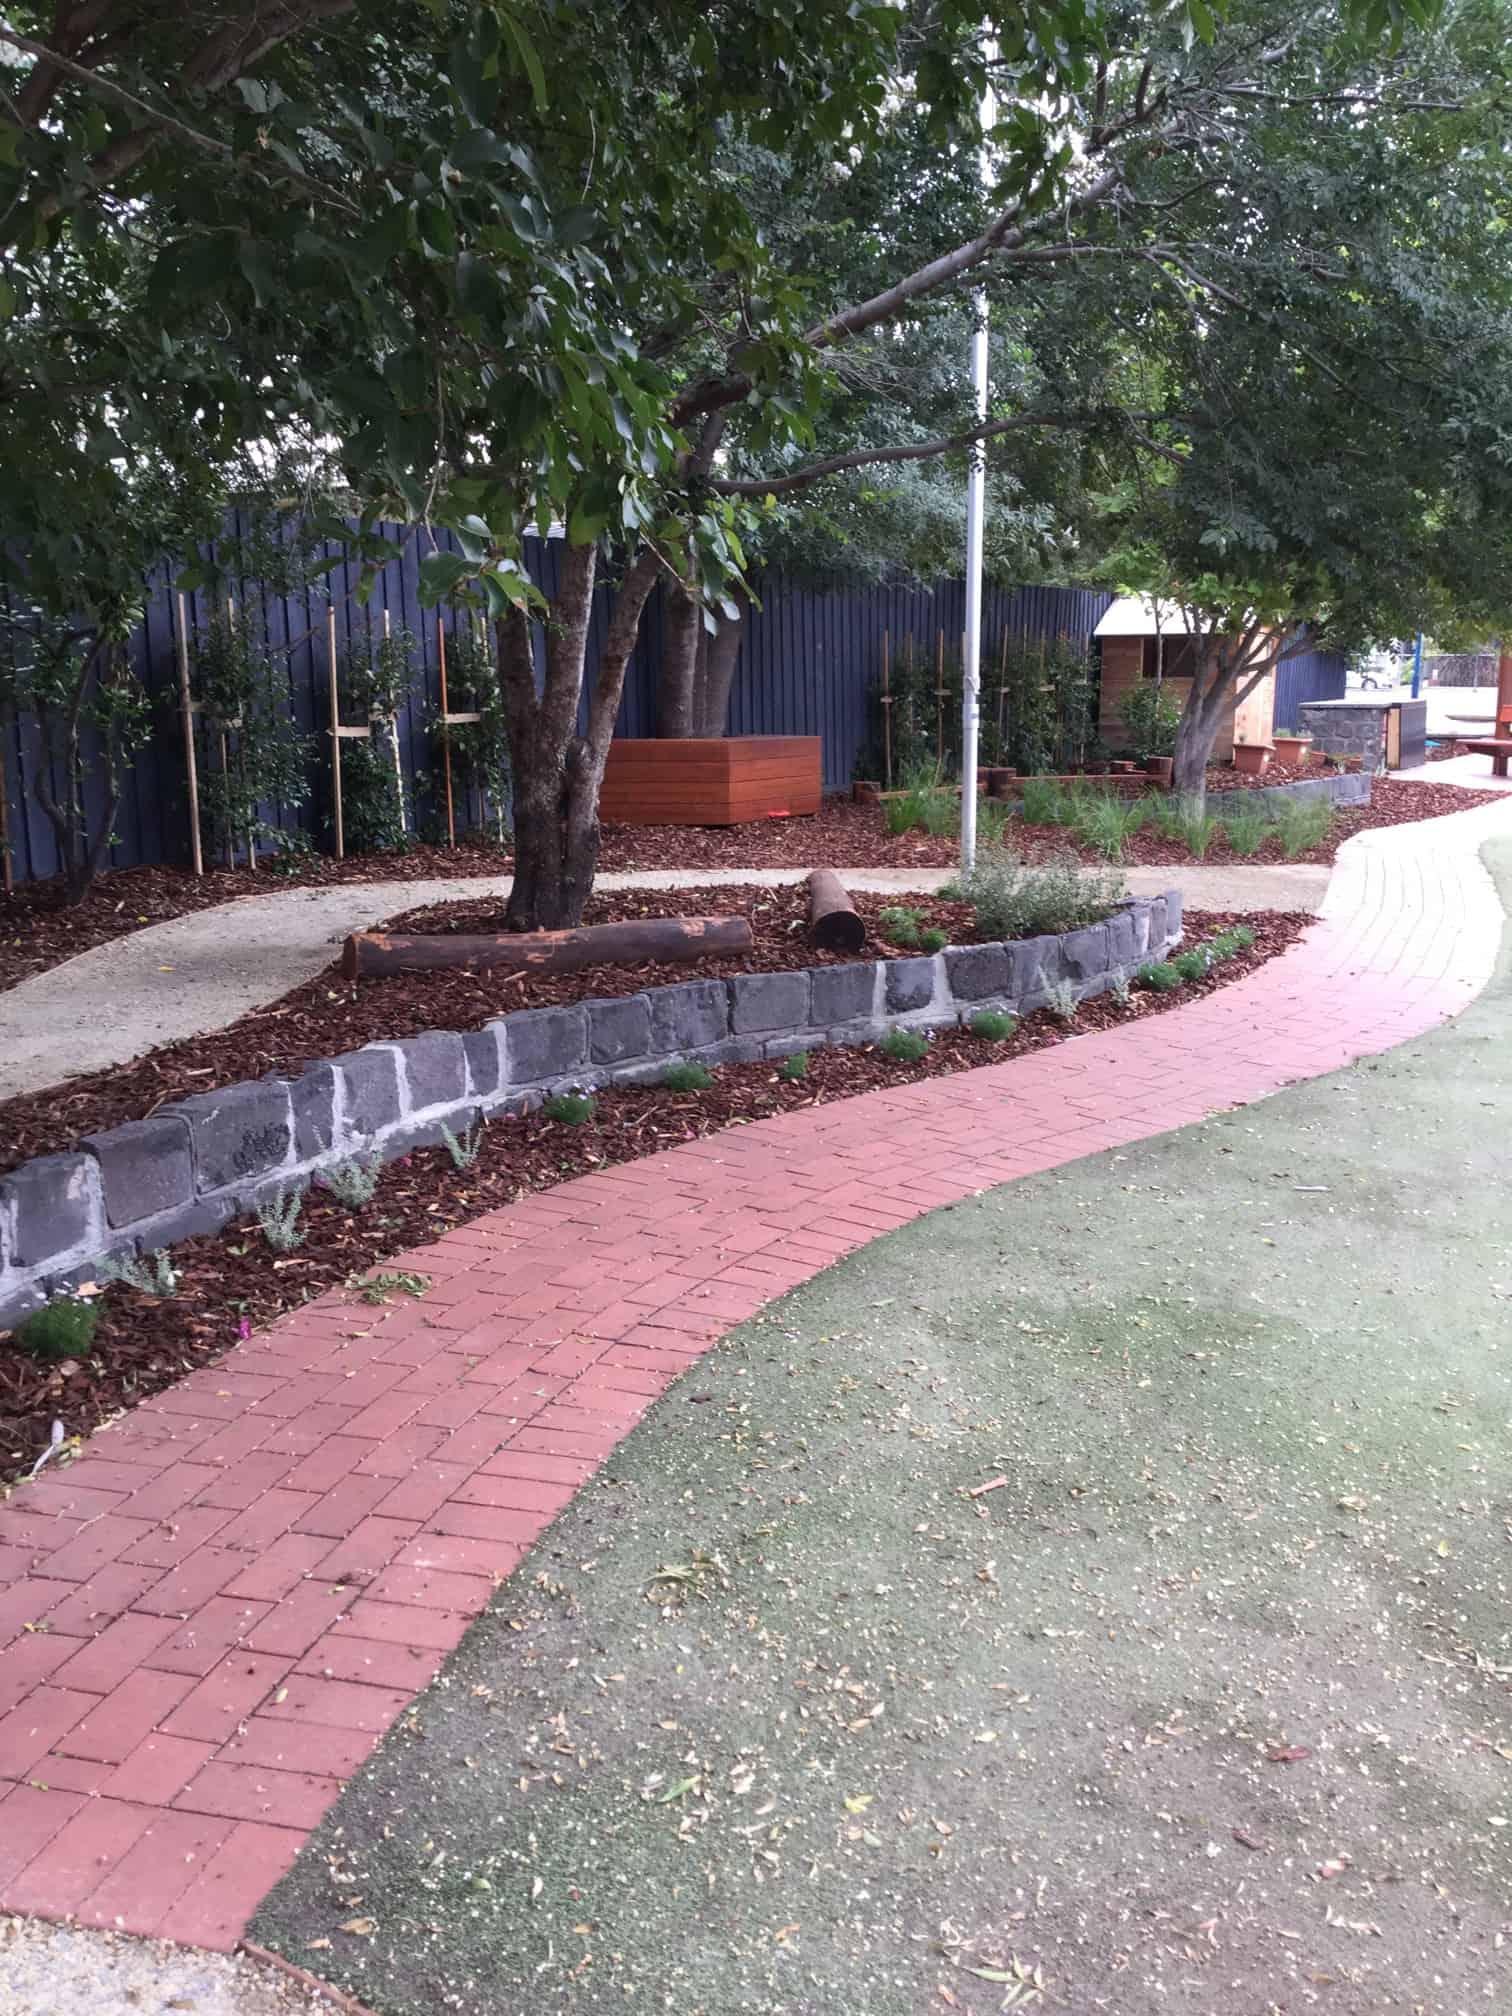 Primary School natural play area Australia